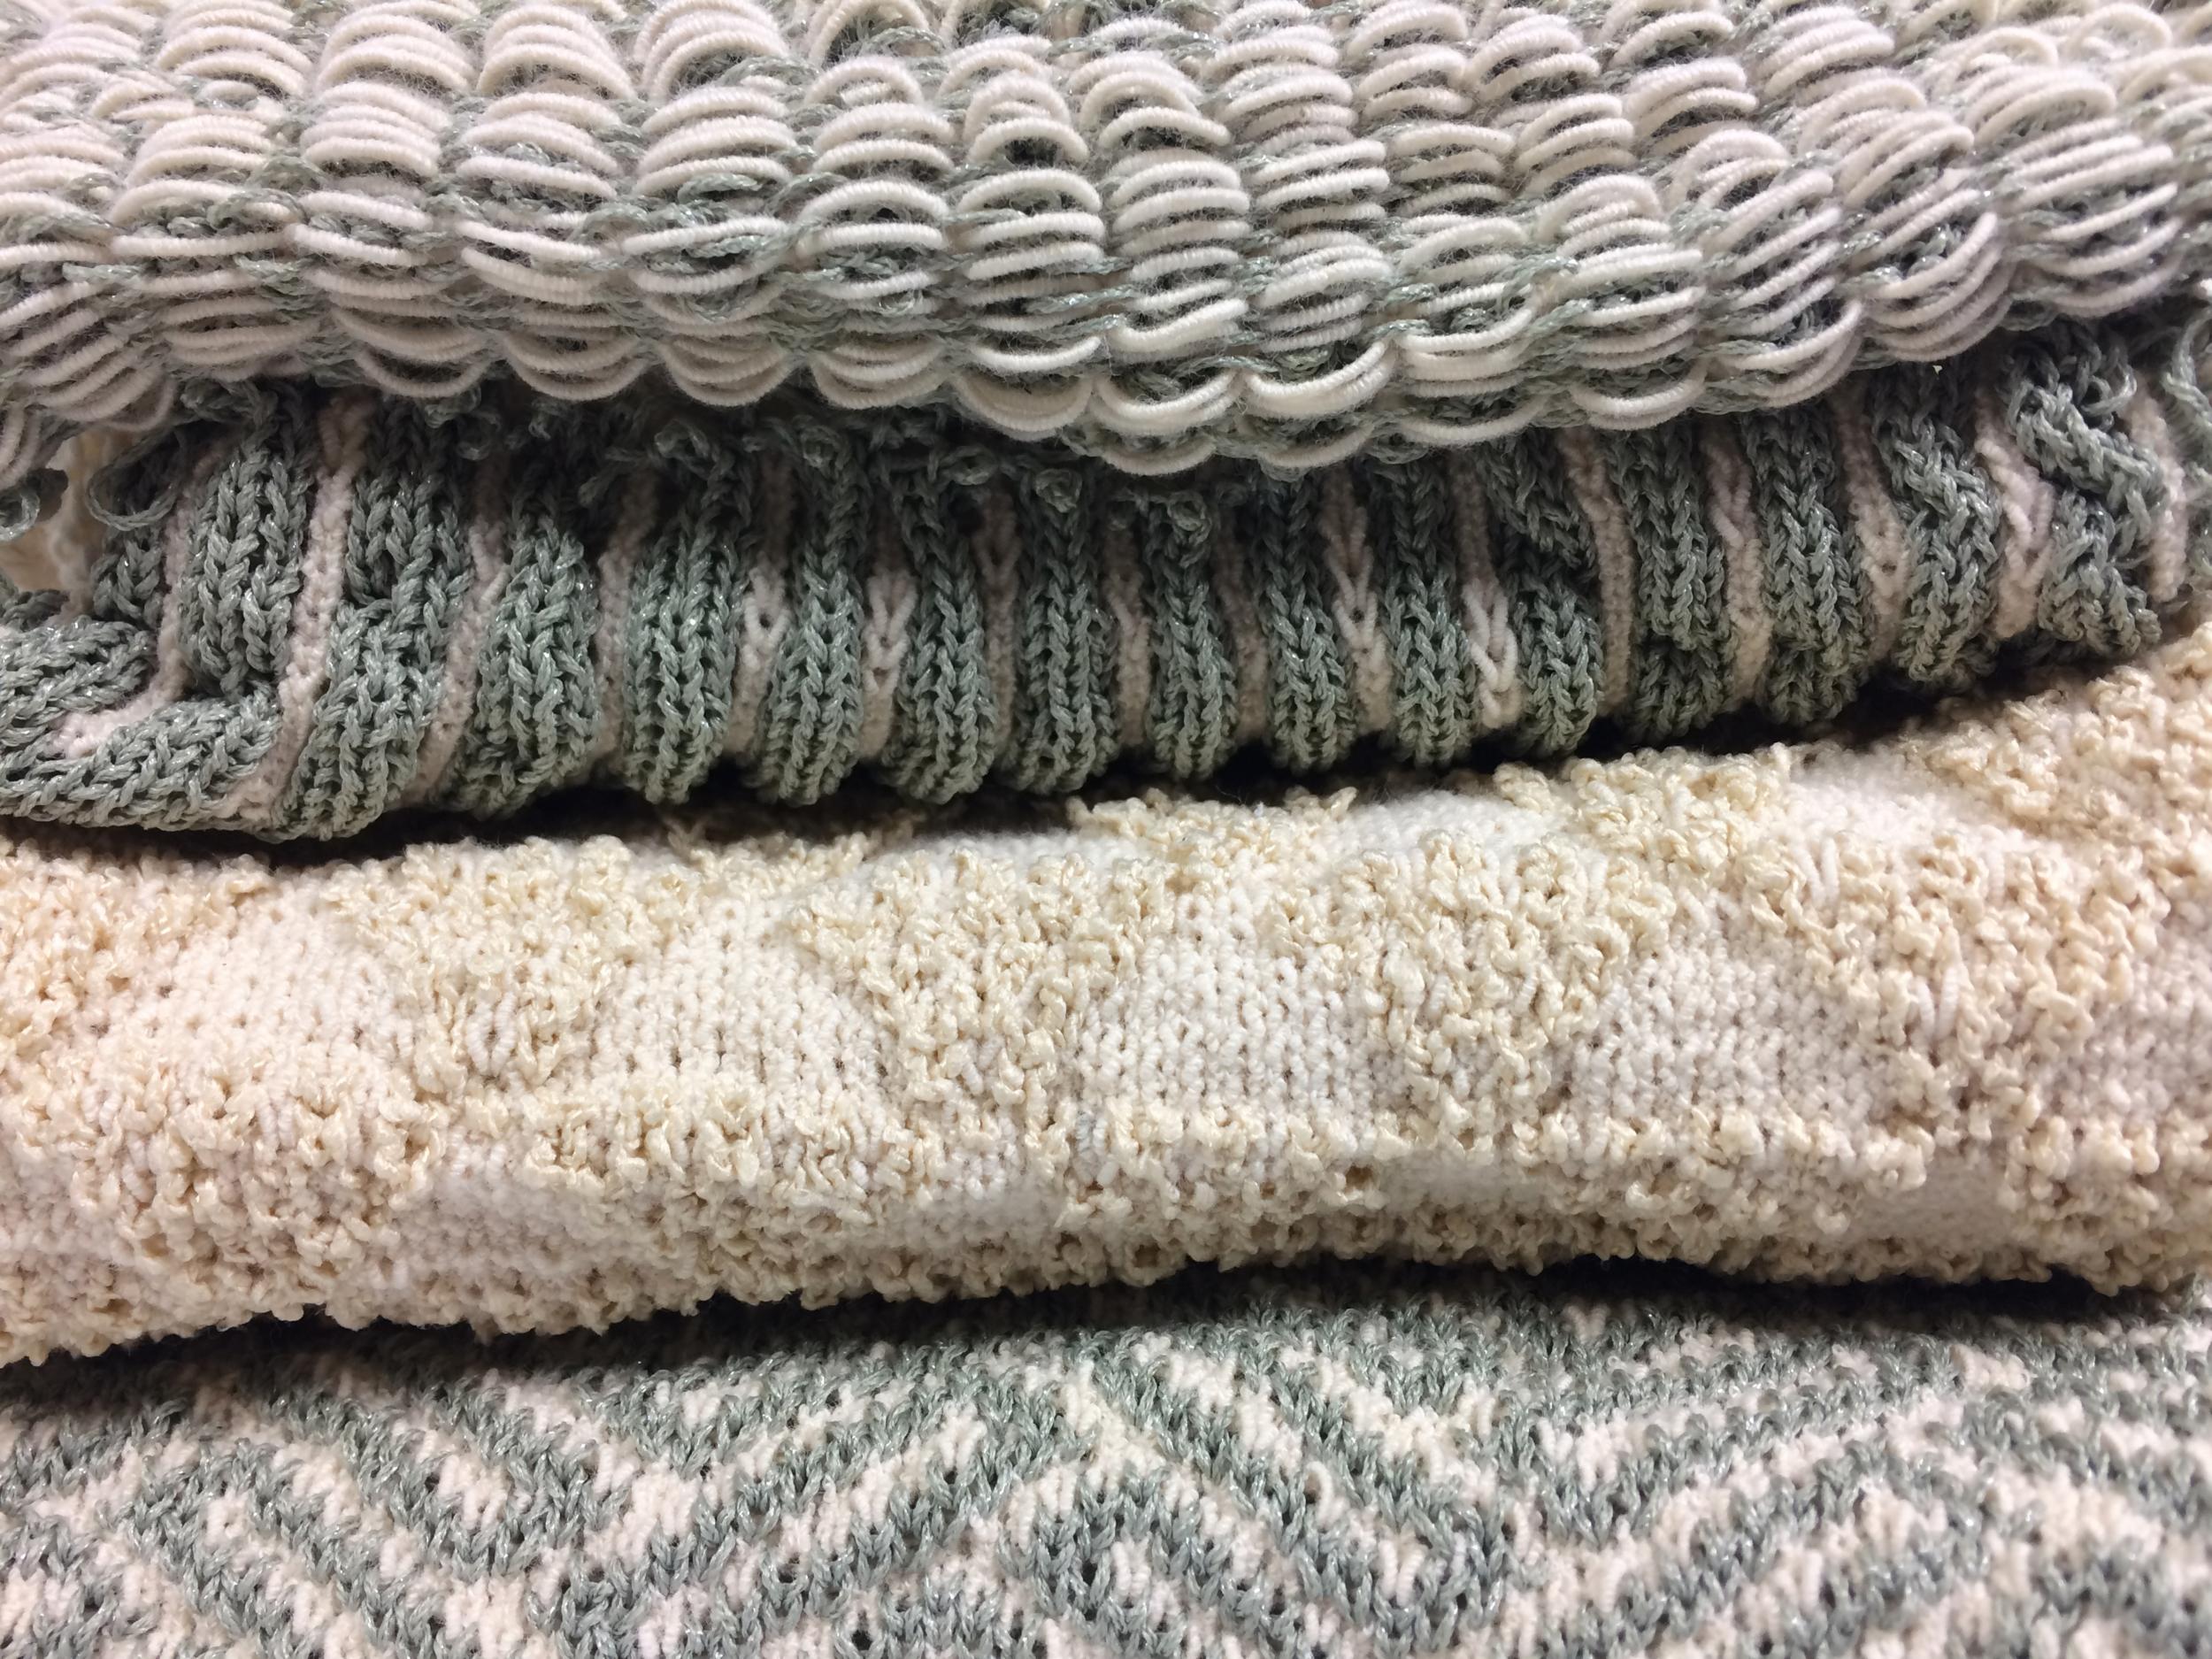 Sampling machine knit swatches